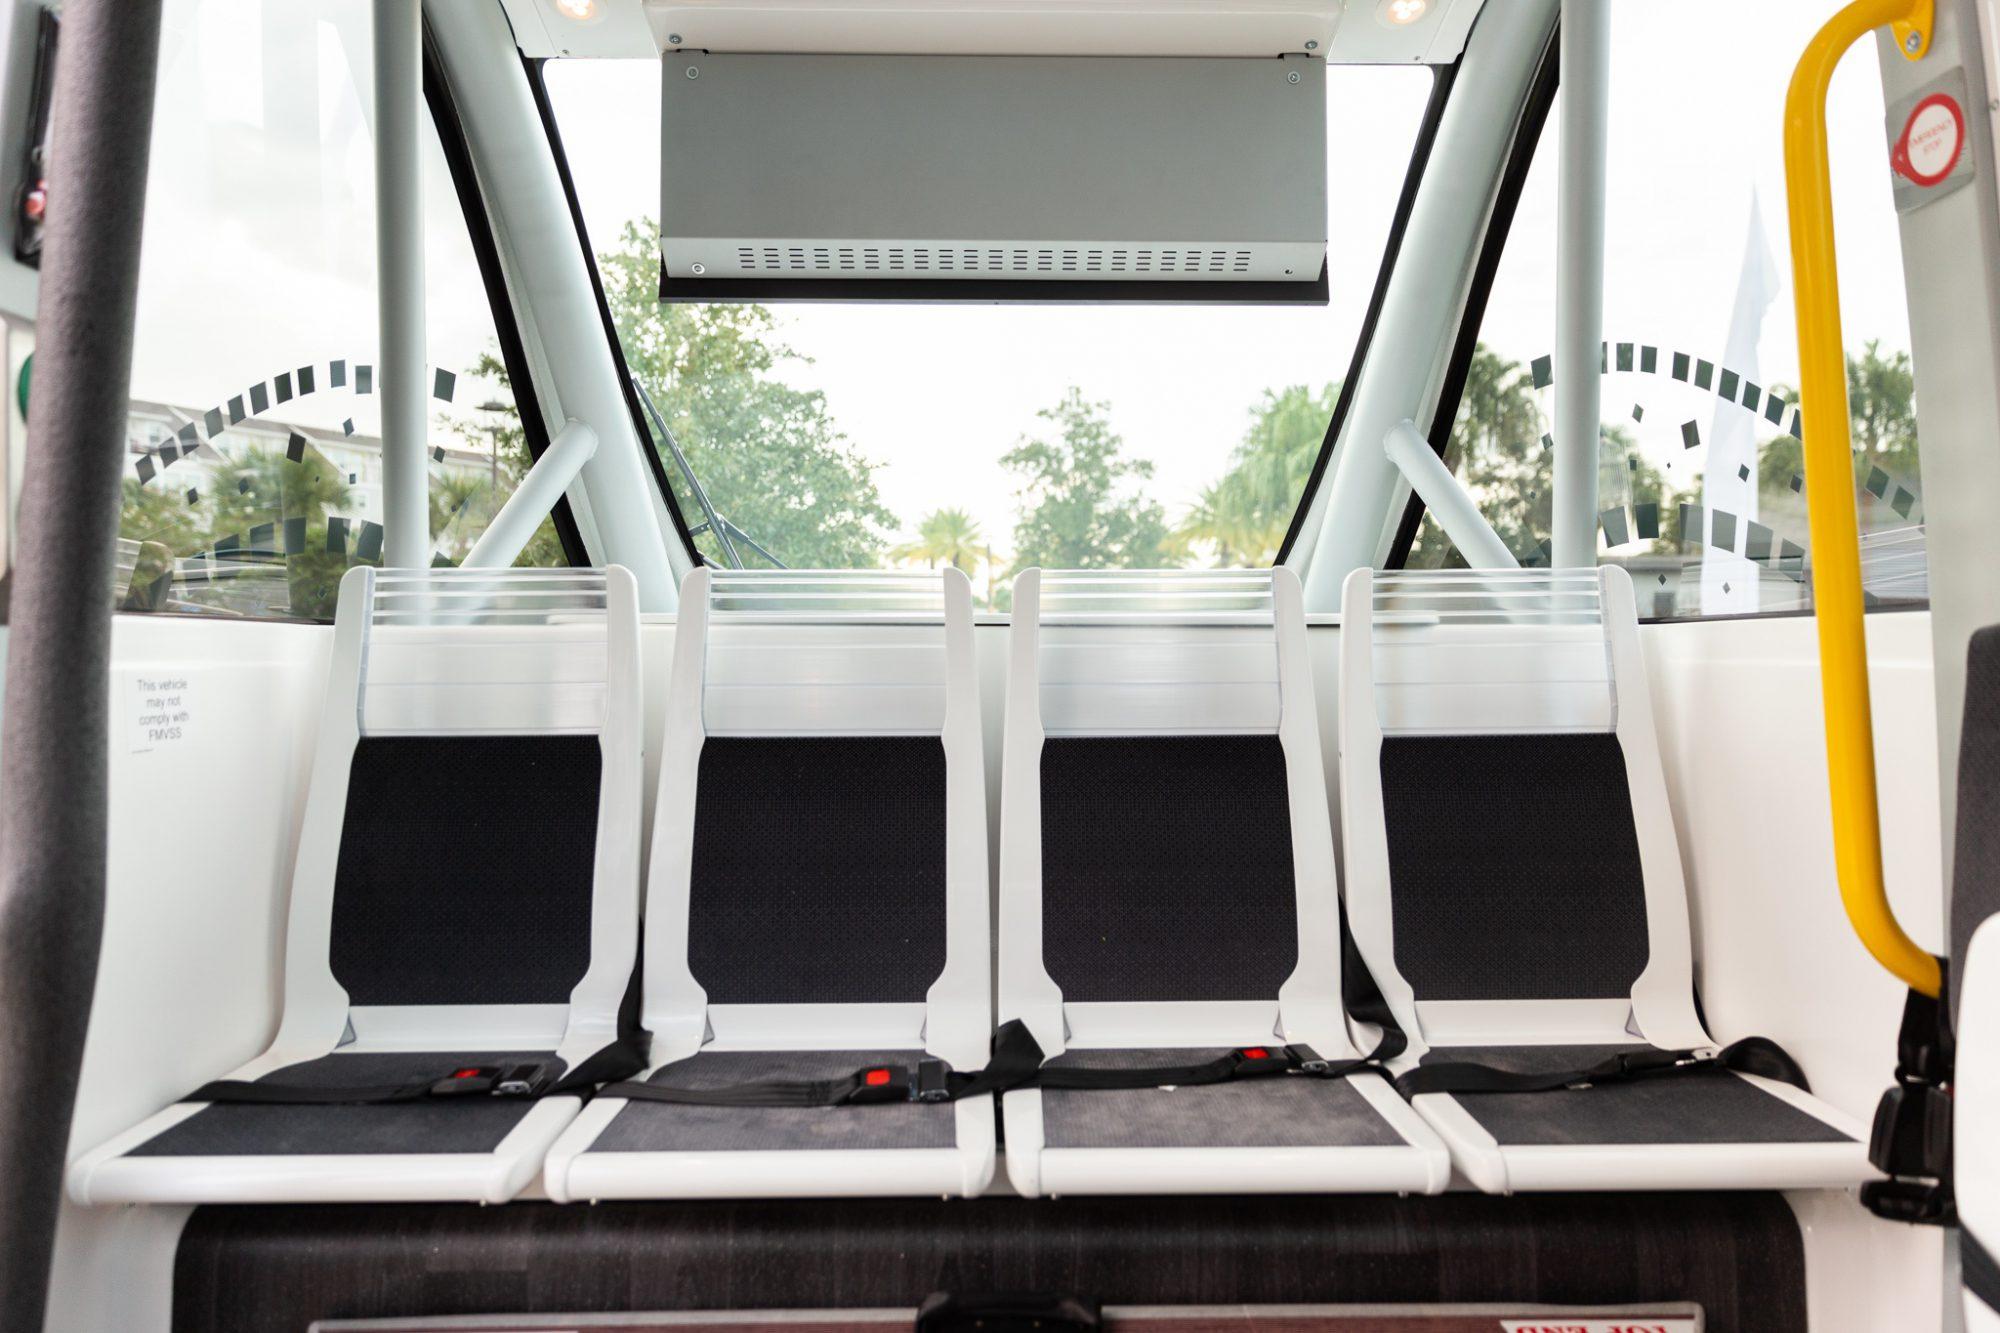 Beep Autonomous Vehicles: Move Nona 4